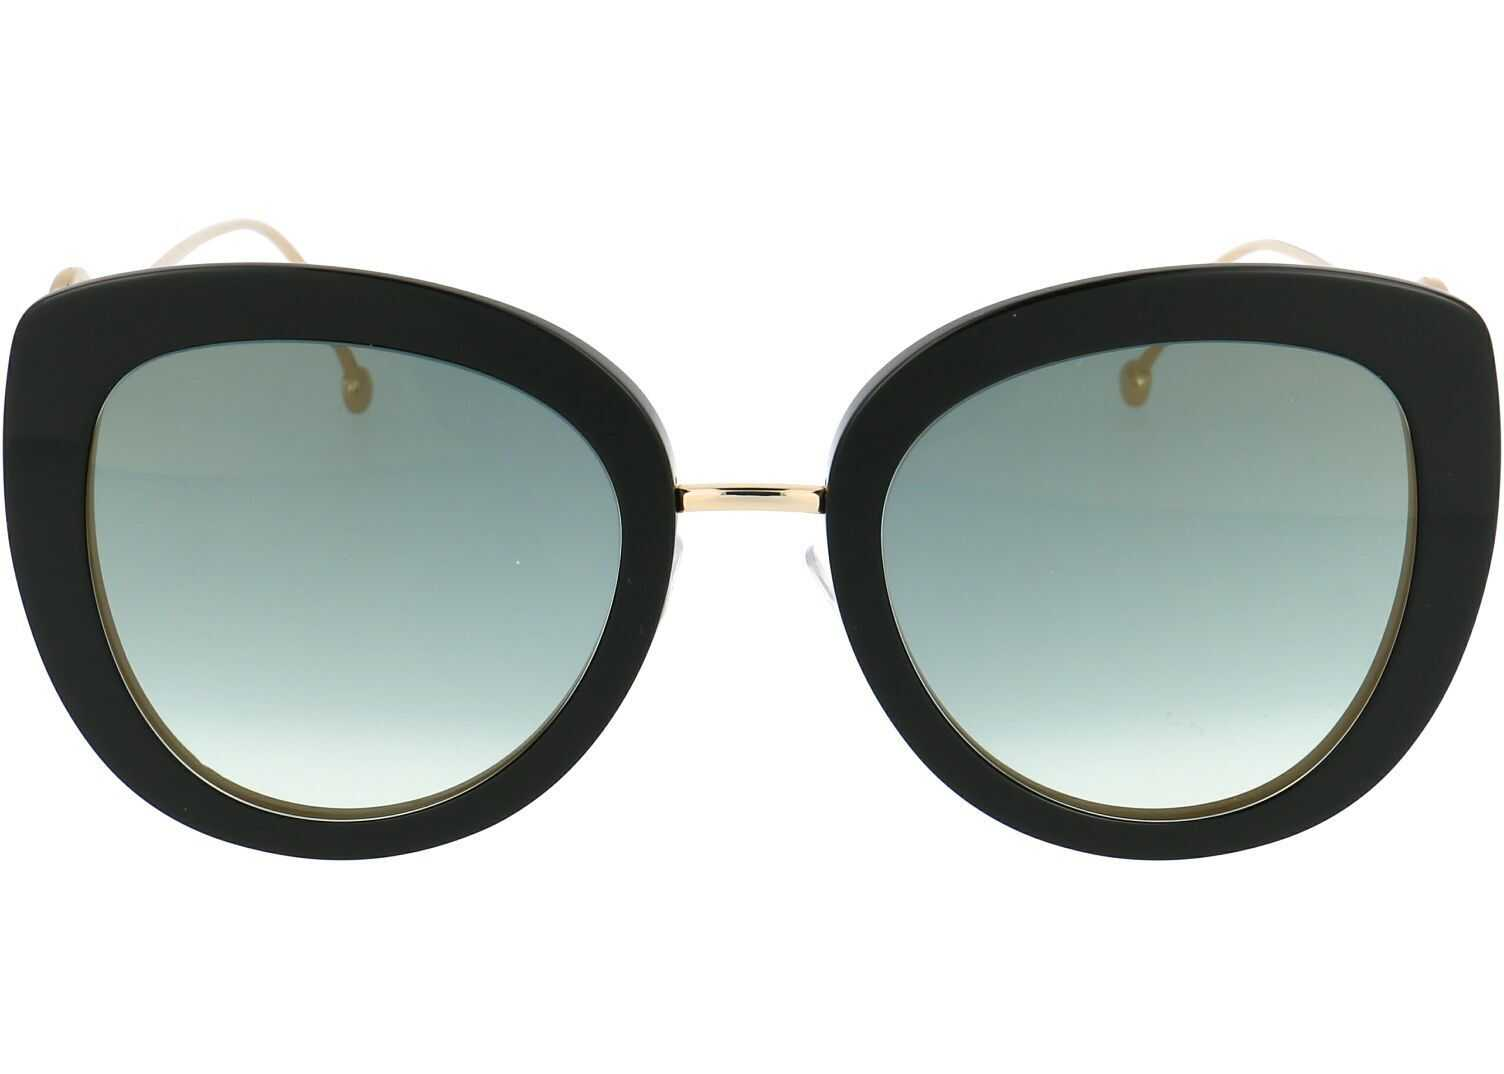 Fendi Metal Sunglasses MULTICOLOR